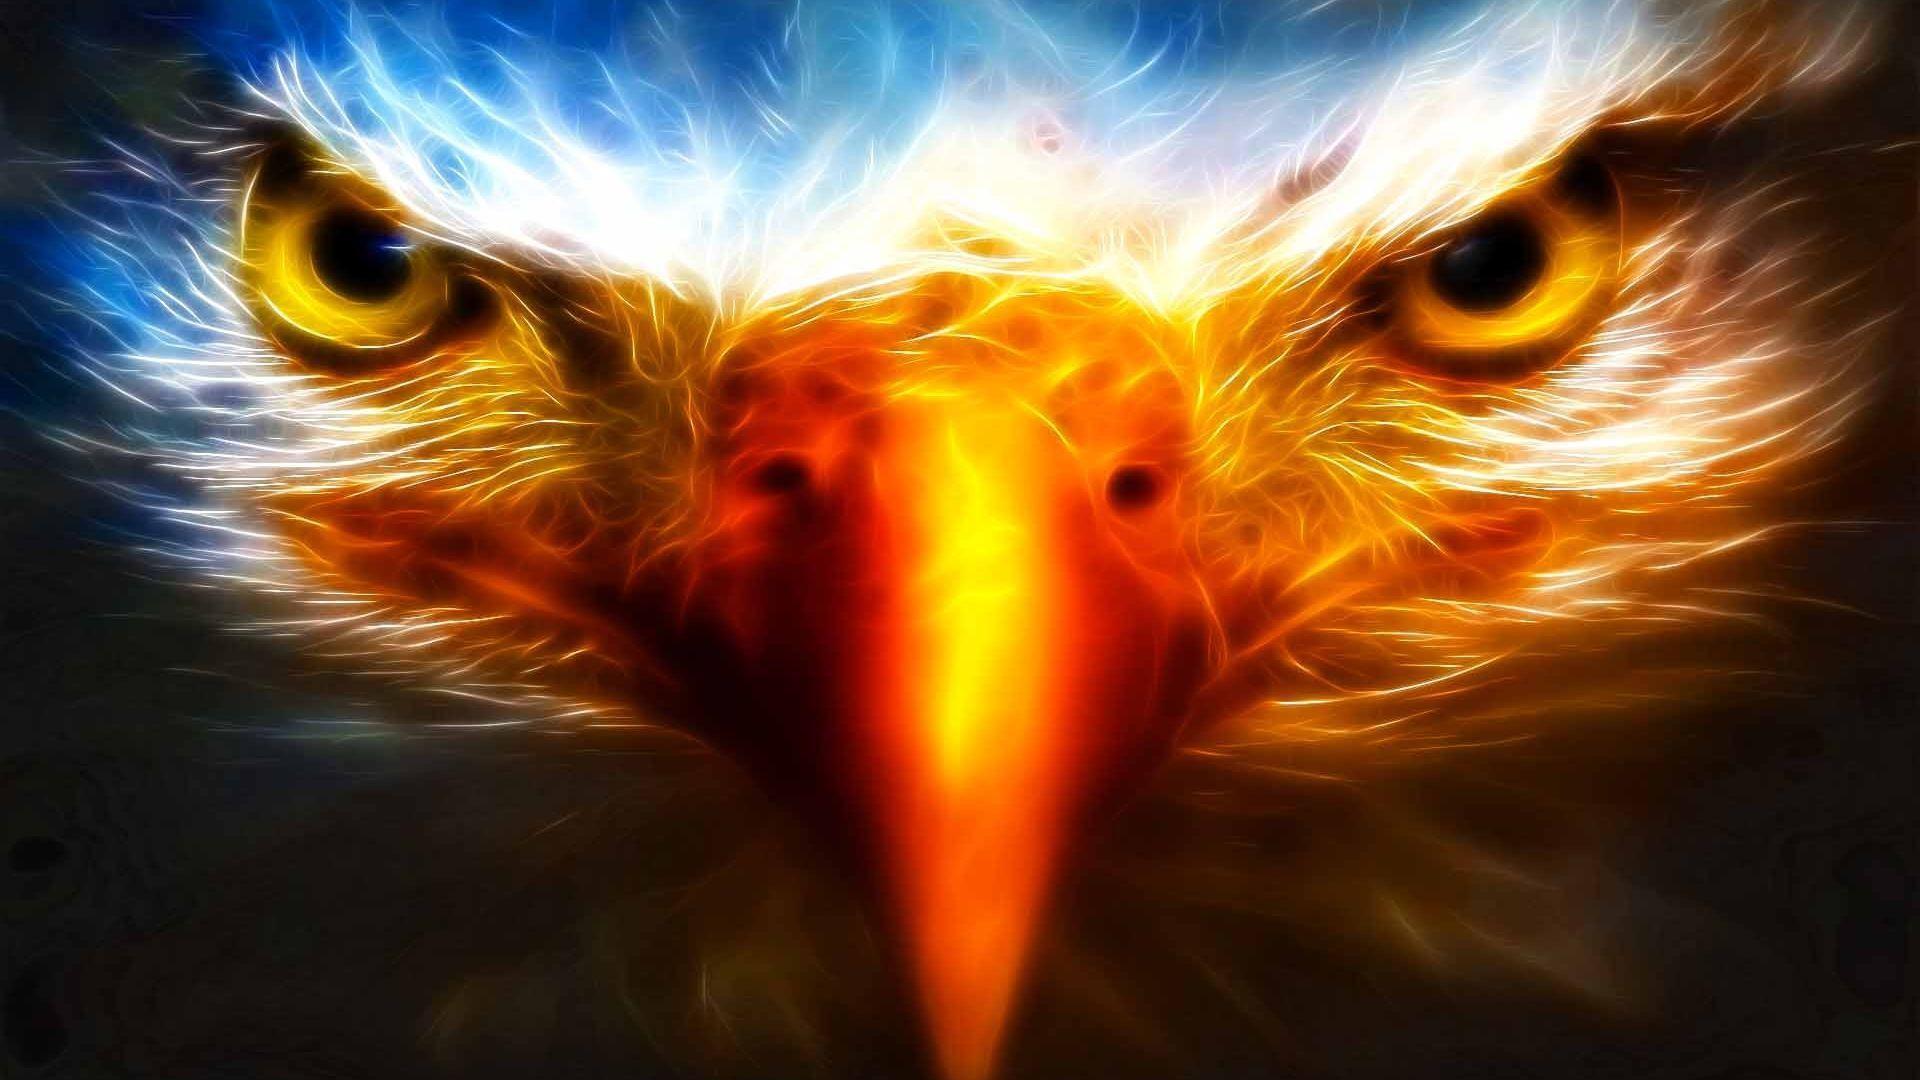 Eagle - DriverLayer Search Engine